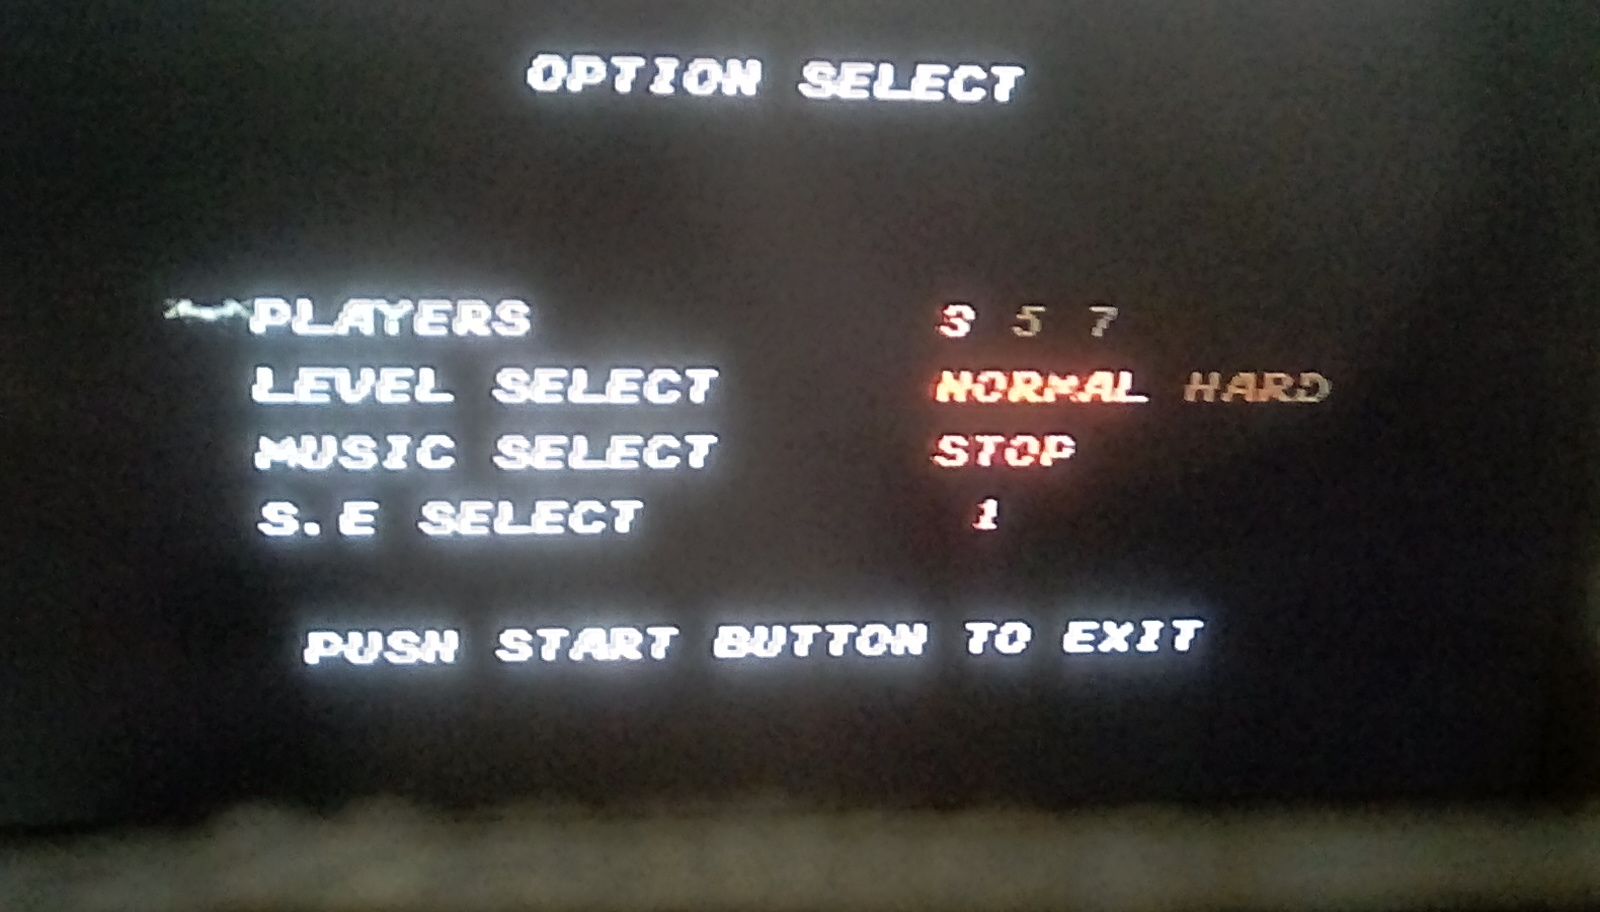 JML101582: Batman [Normal] (Sega Genesis / MegaDrive Emulated) 25,300 points on 2019-06-21 20:16:58